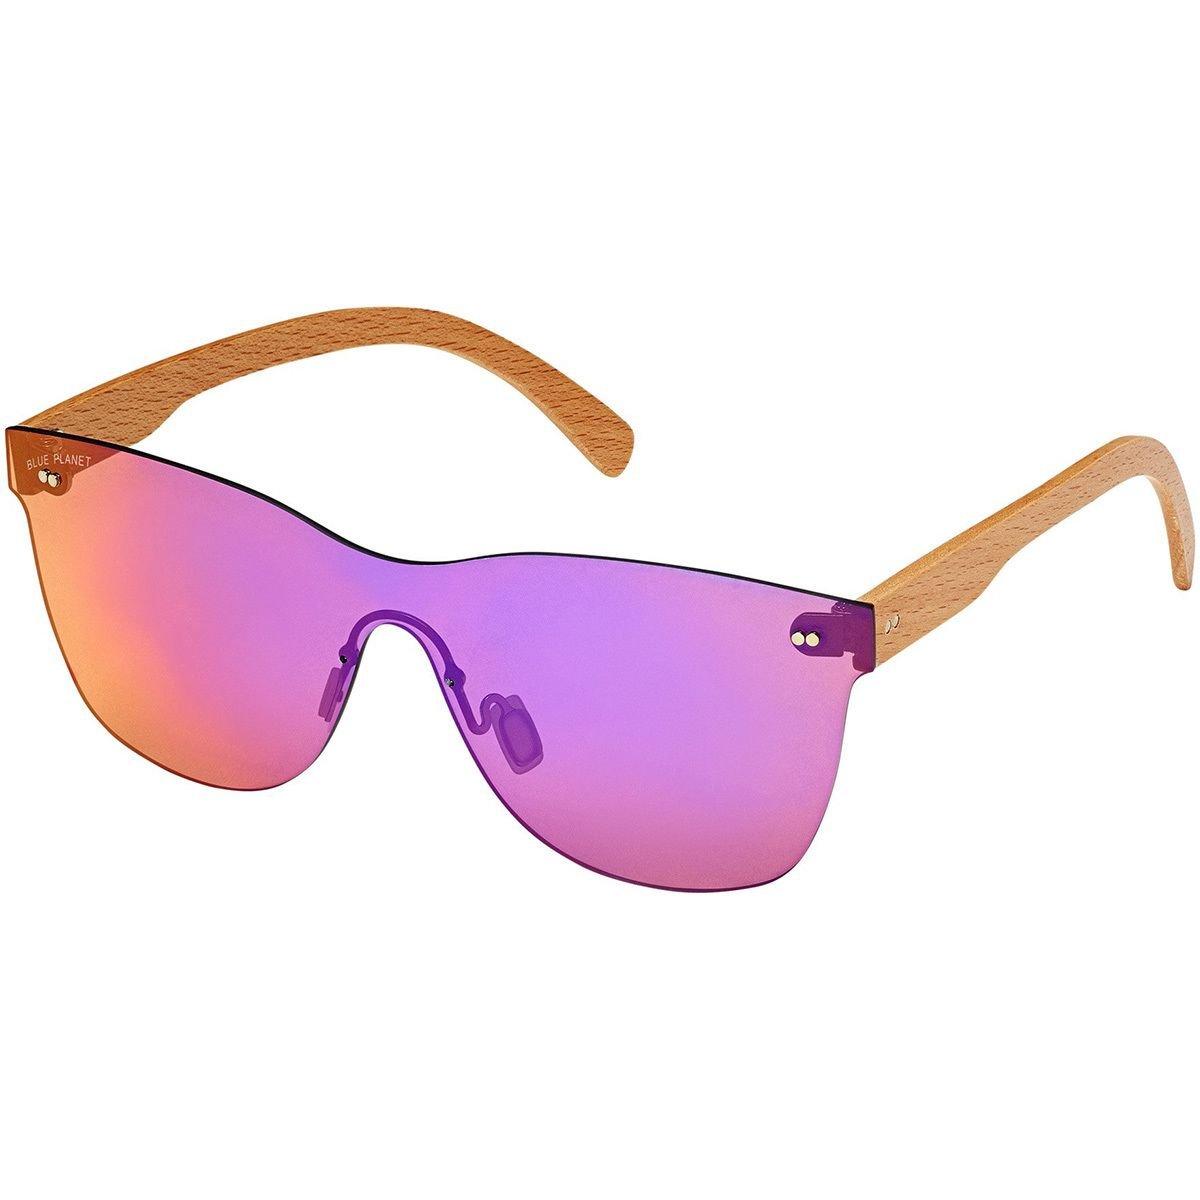 3bf21553cd3 Blue Planet Eyewear Delmar Sunglasses - Women s Single Lens Beechwood Blue  Mirror